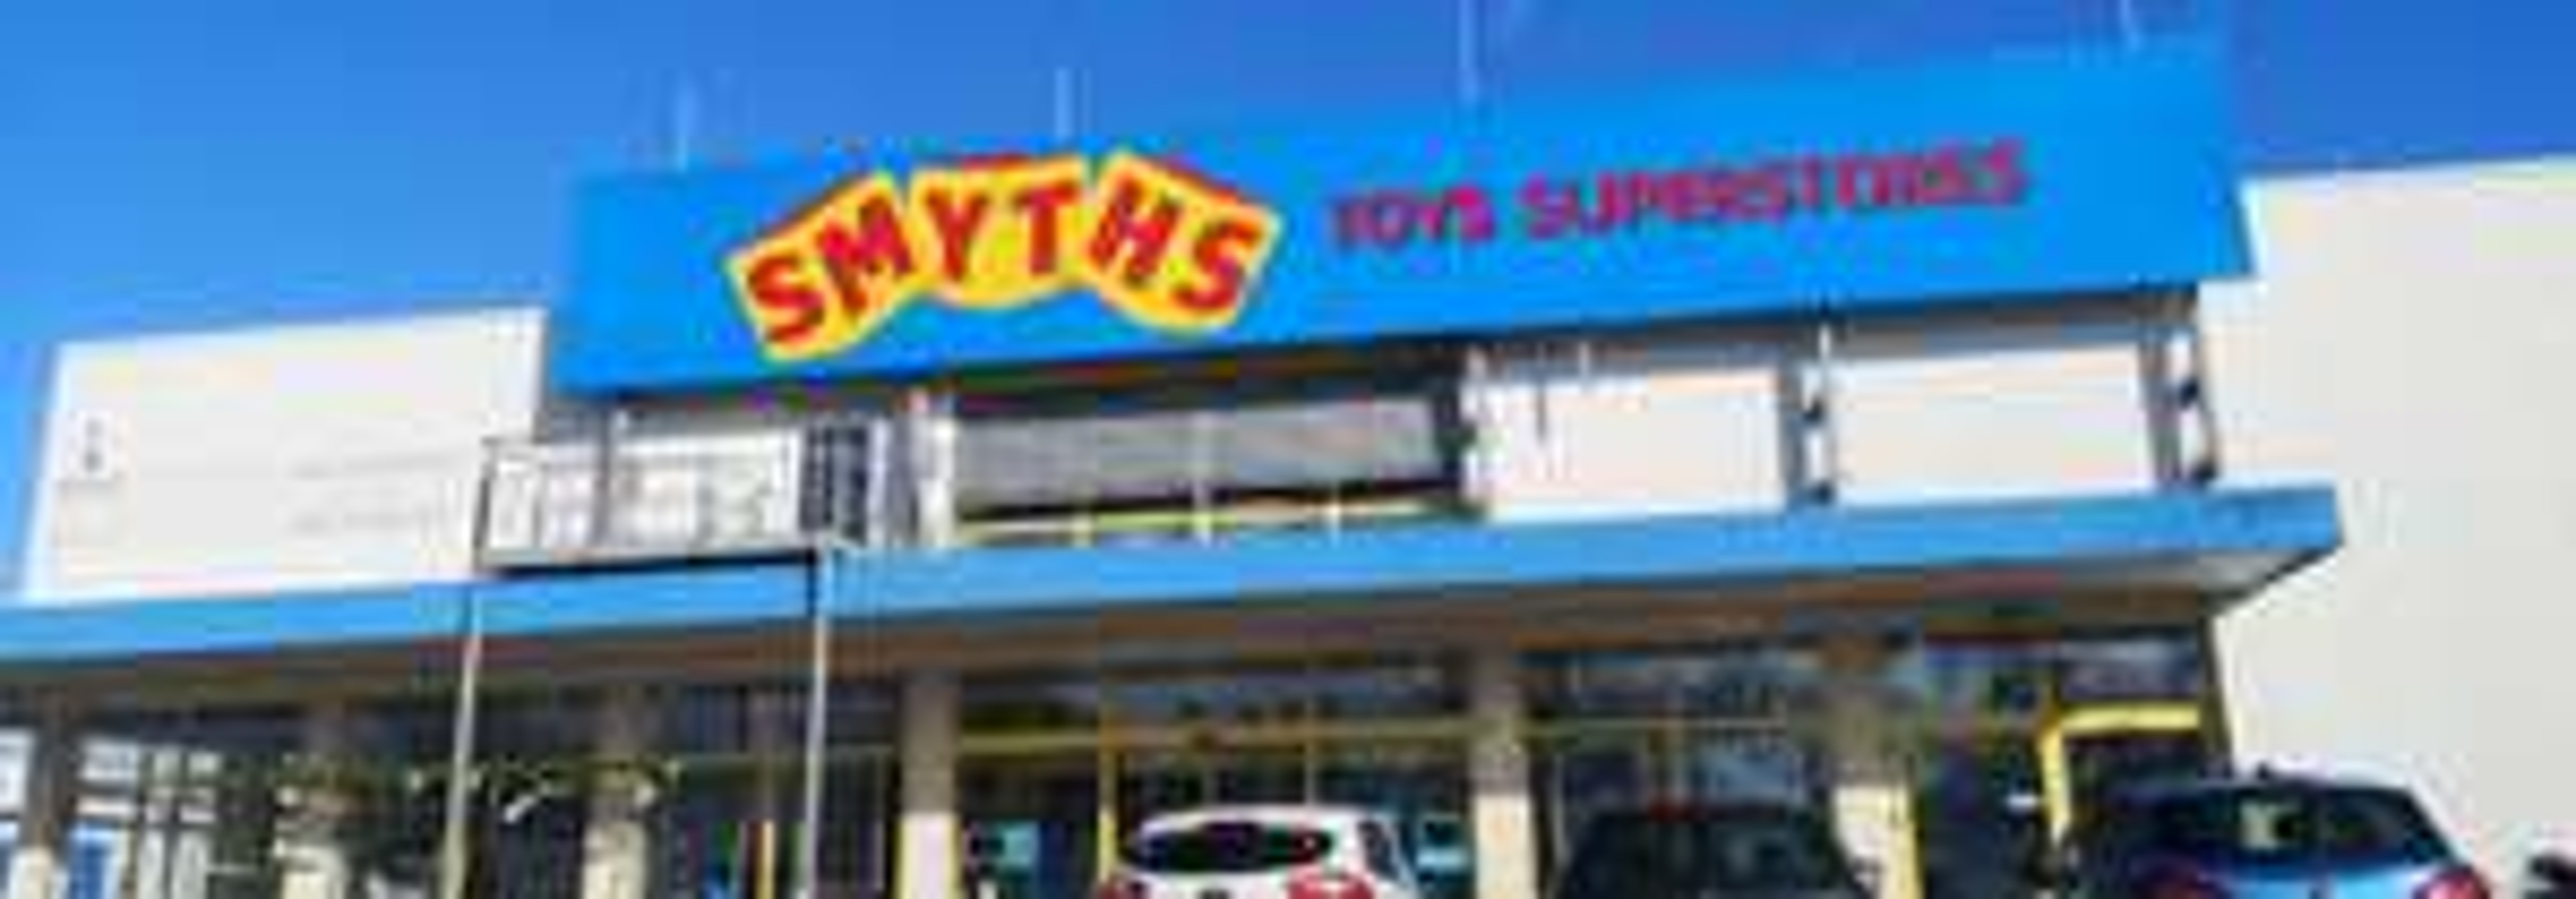 [Lokal Dortmund Indupark] SMYTHS Toys,  Spielsand 20kg 0,50€, Carrera Sprint 30€ , MTB ab 80€, Tefal XXL Küche 20€ usw.